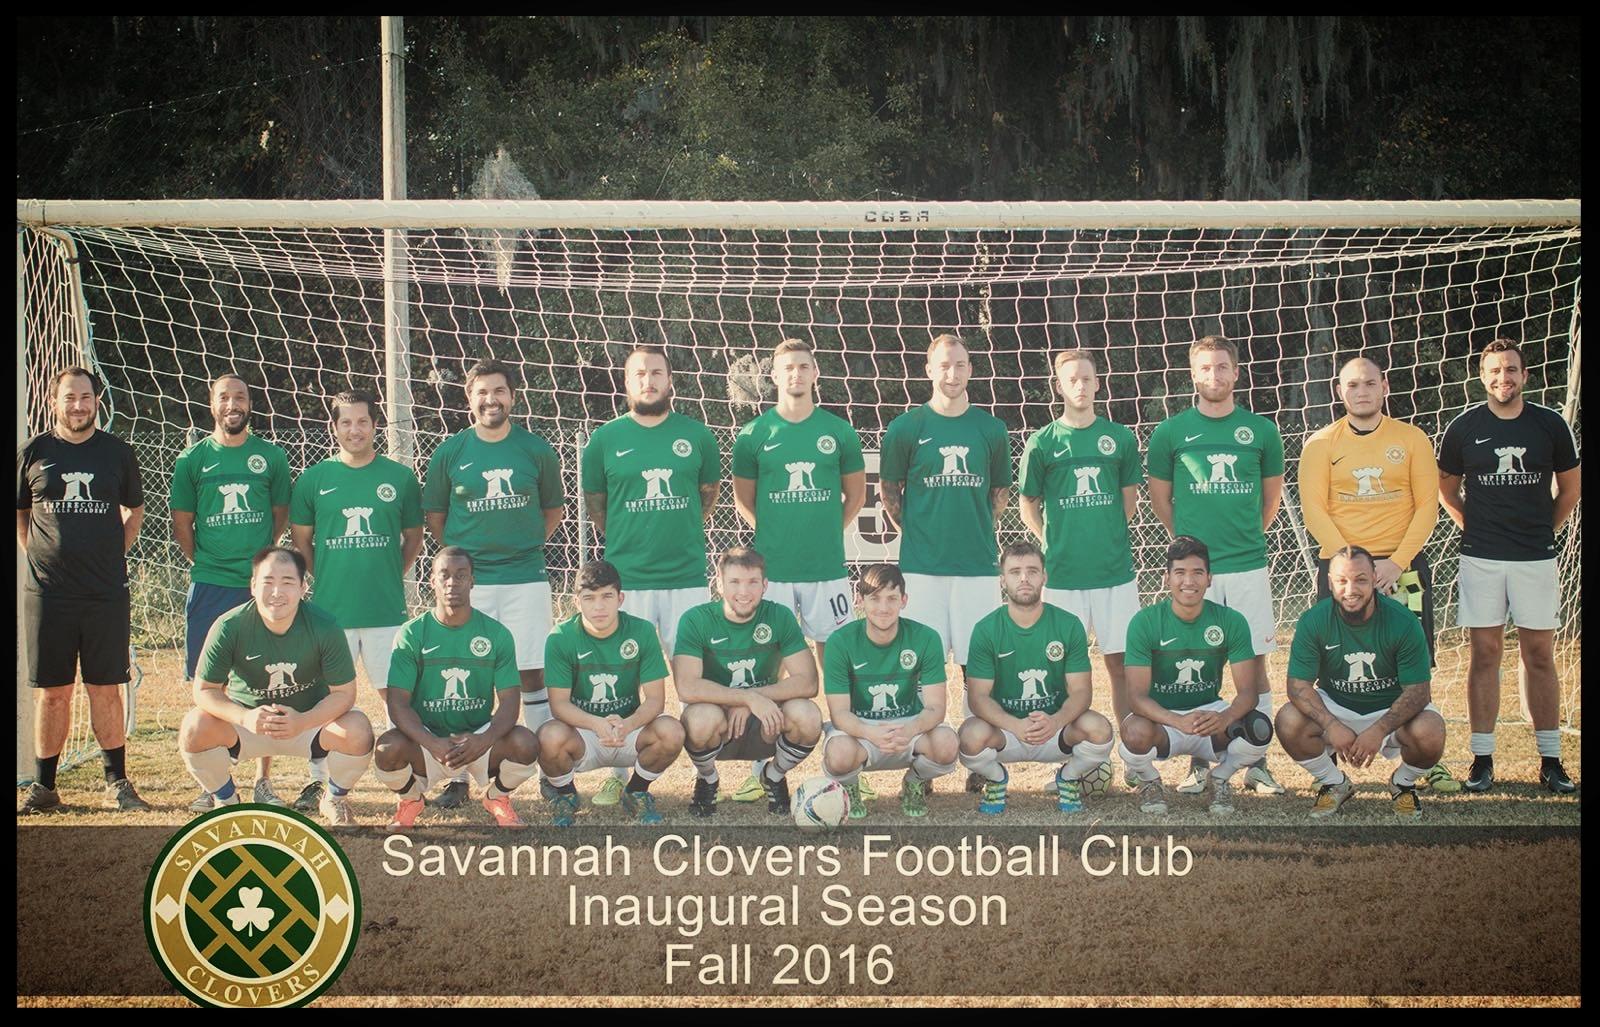 2016 SAVANNAH CLOVERS FOOTBALL CLUB